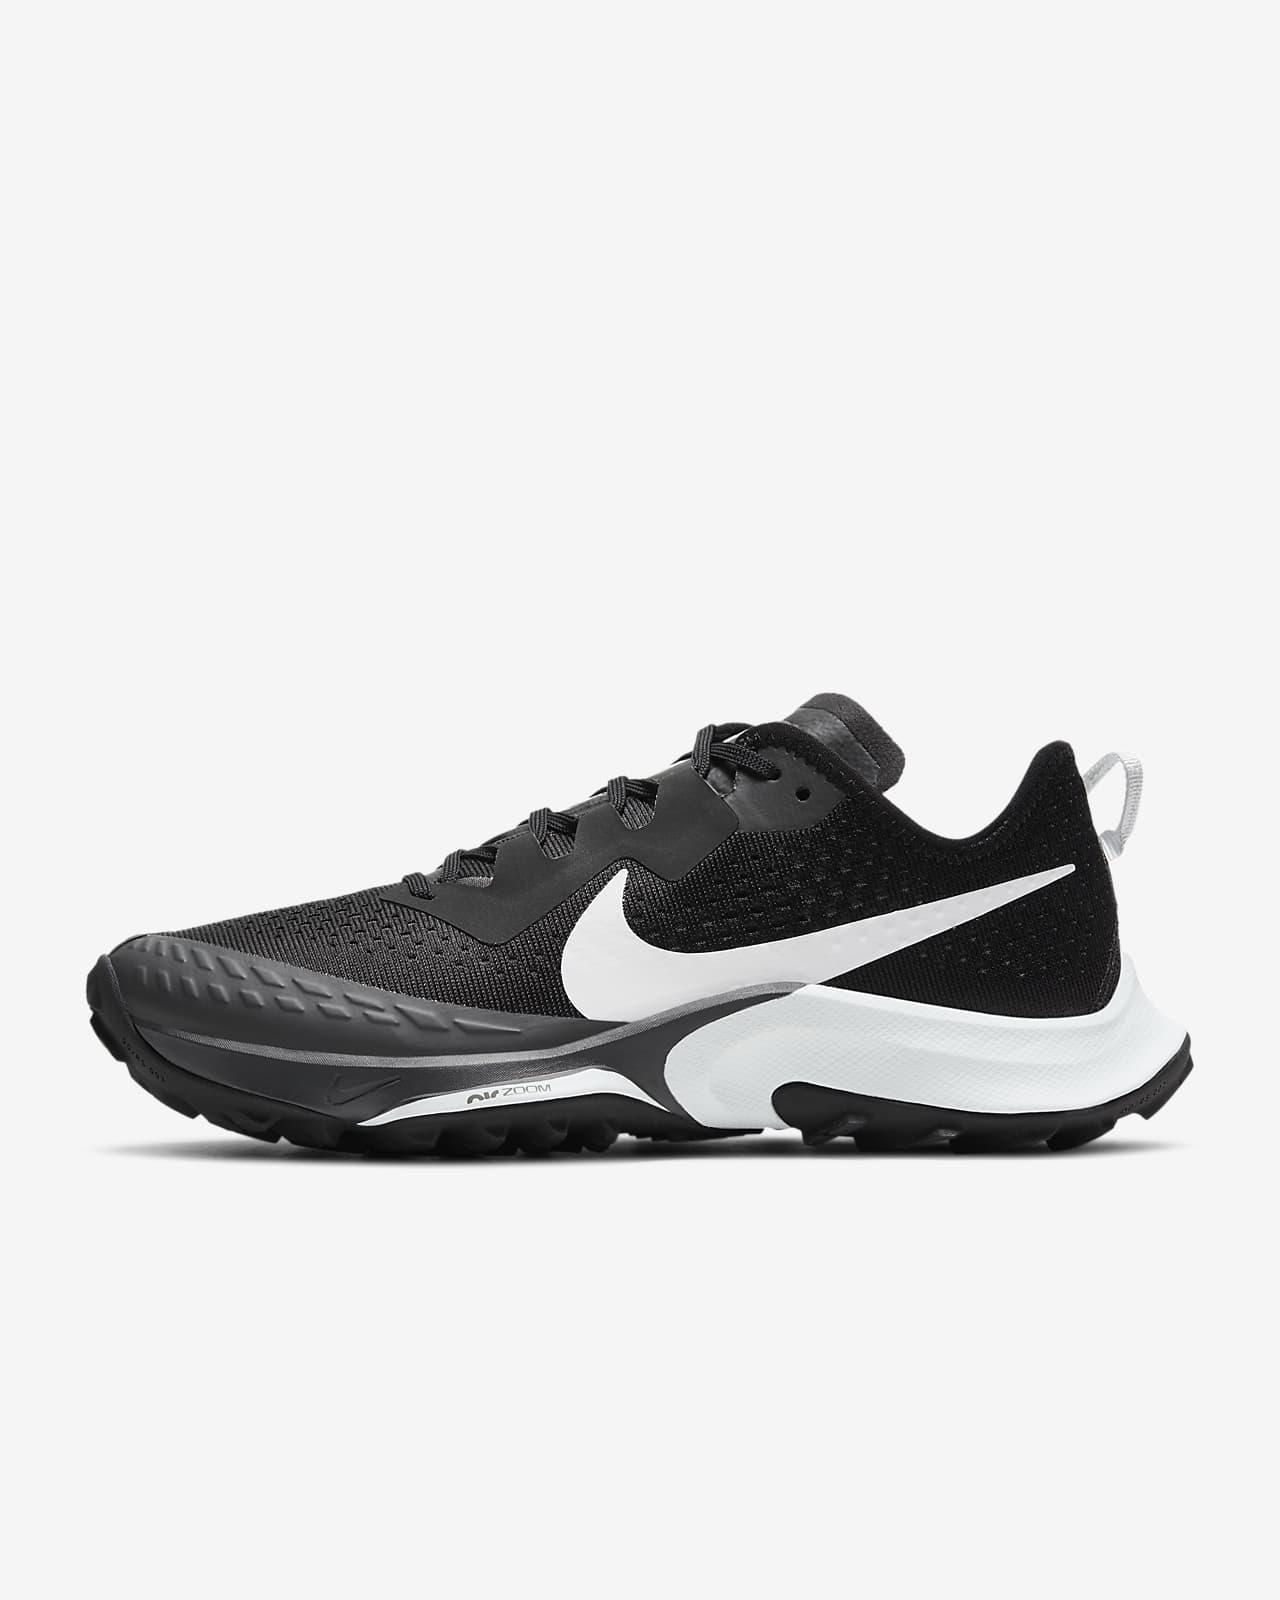 Dámská běžecká trailová bota Nike Air Zoom Terra Kiger7